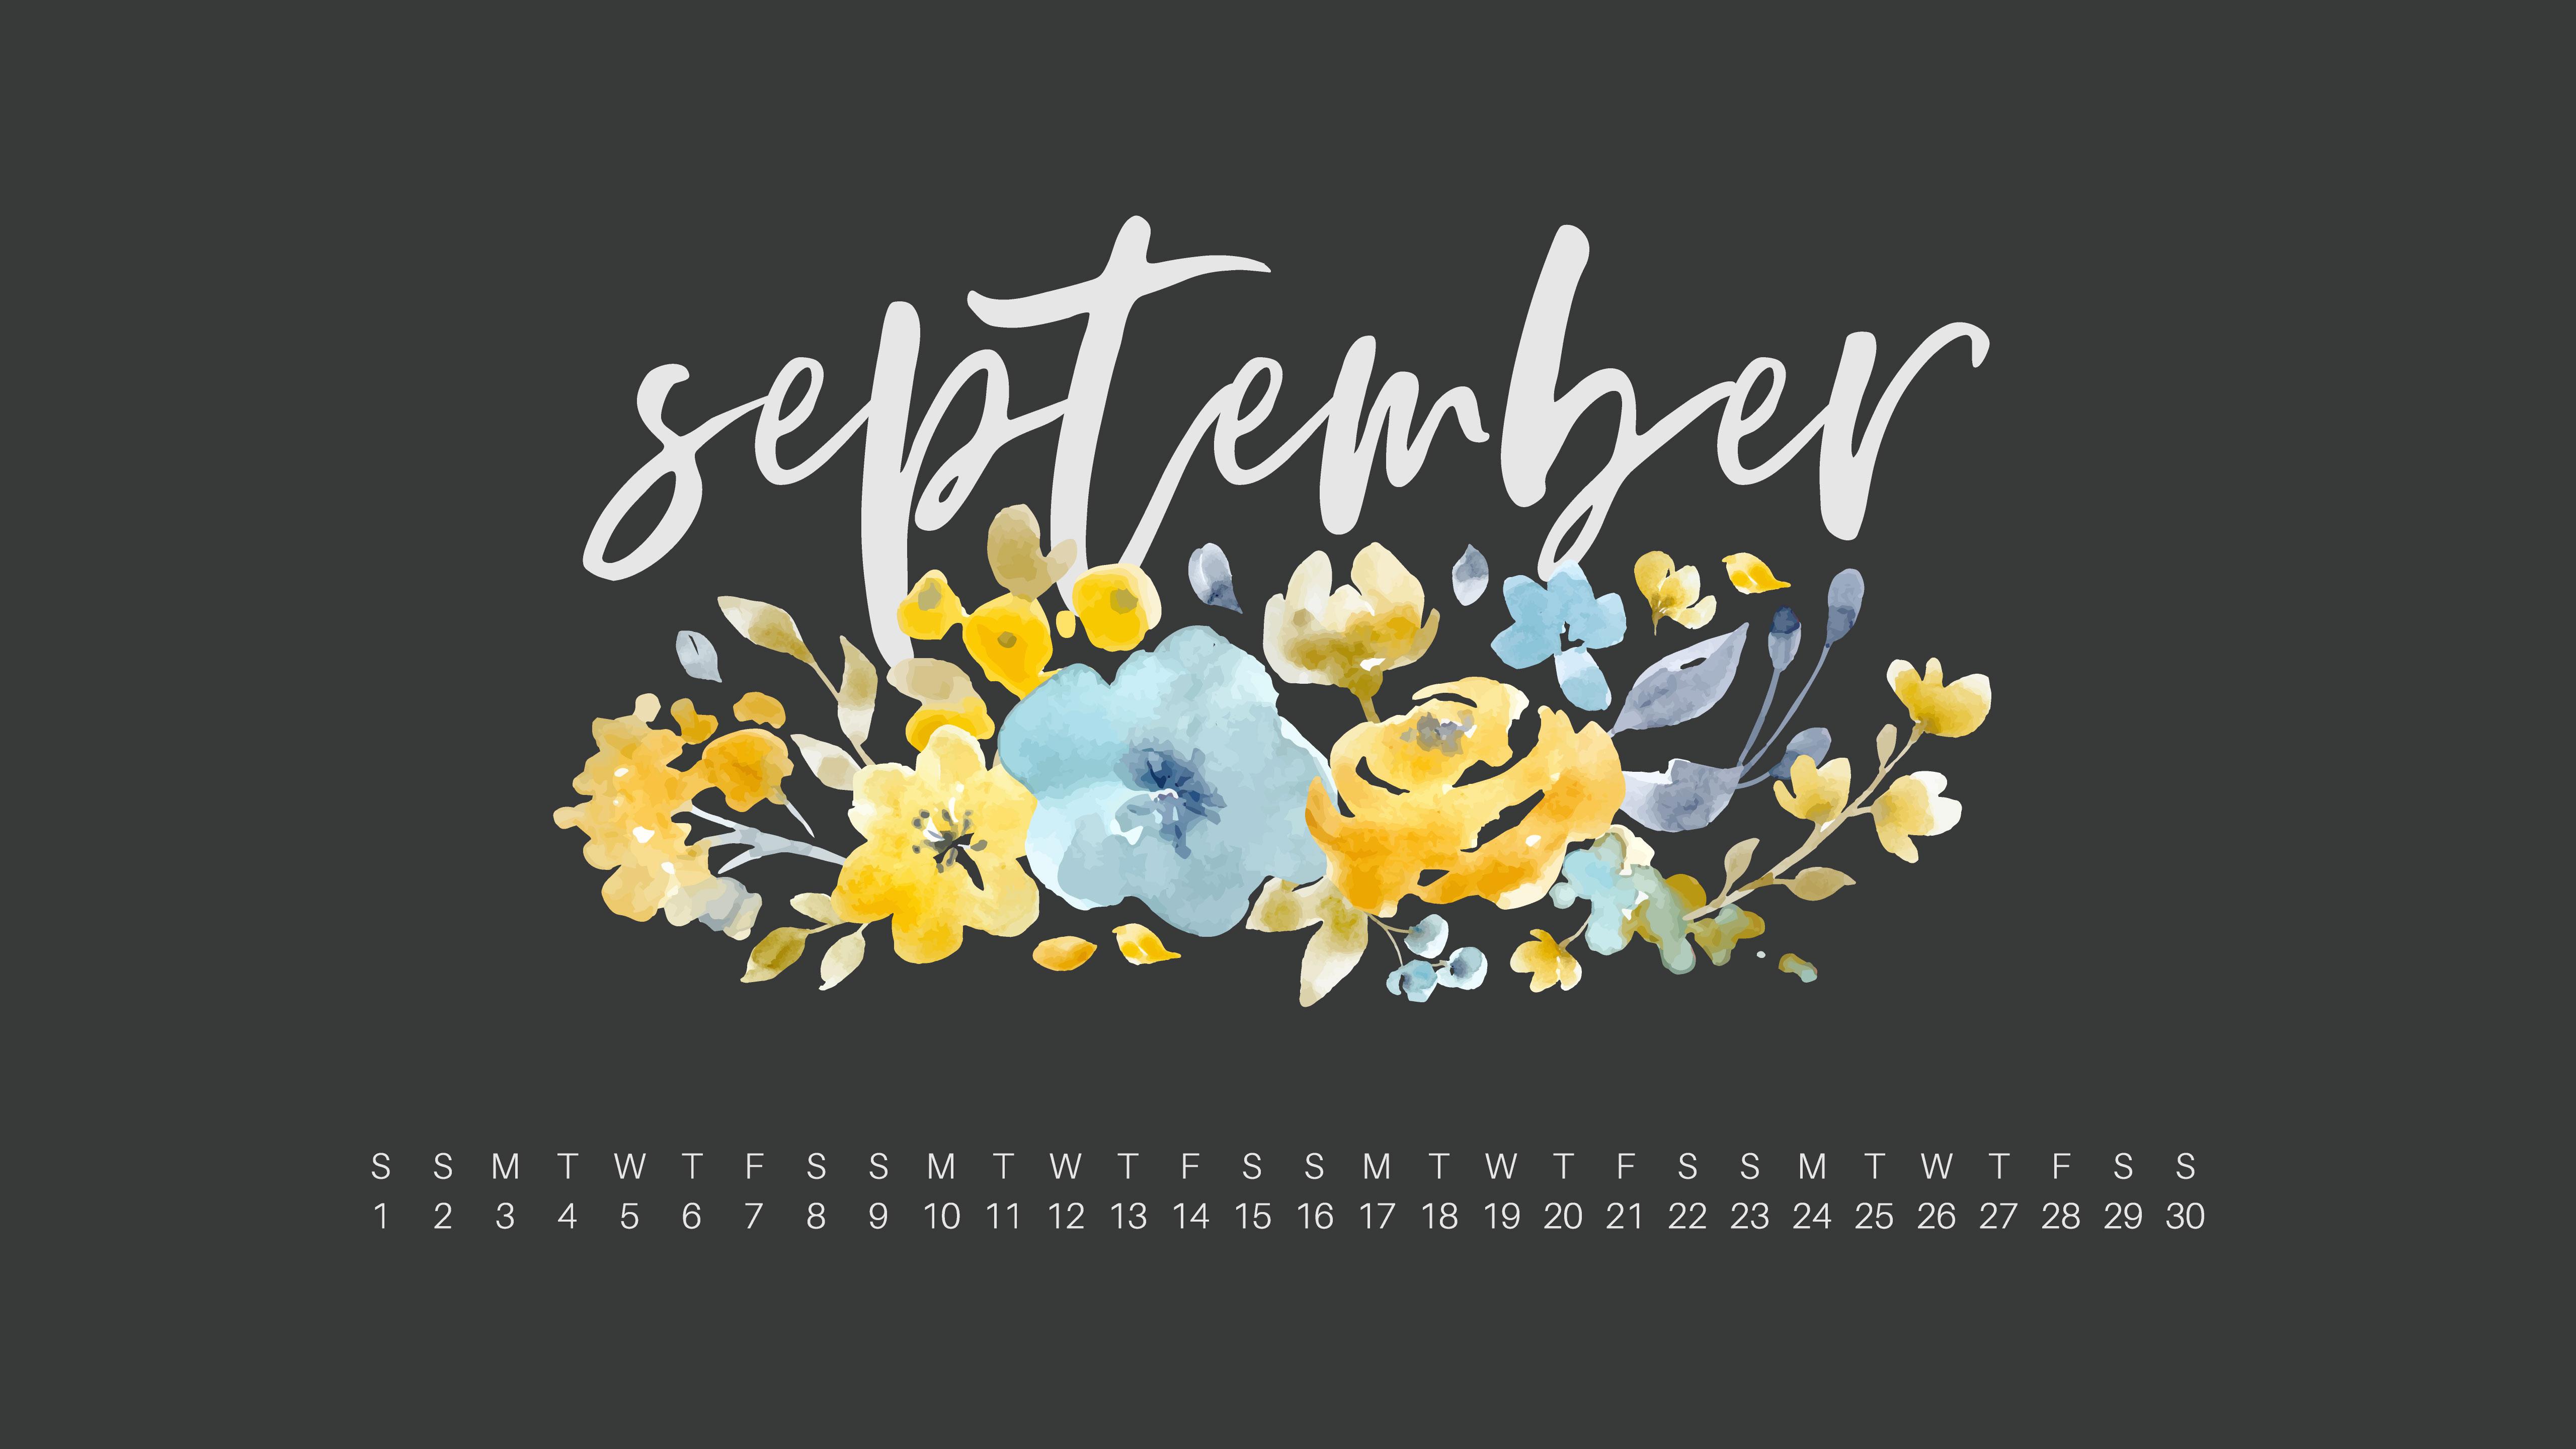 Desktop Calendar Wallpaper UpperCase